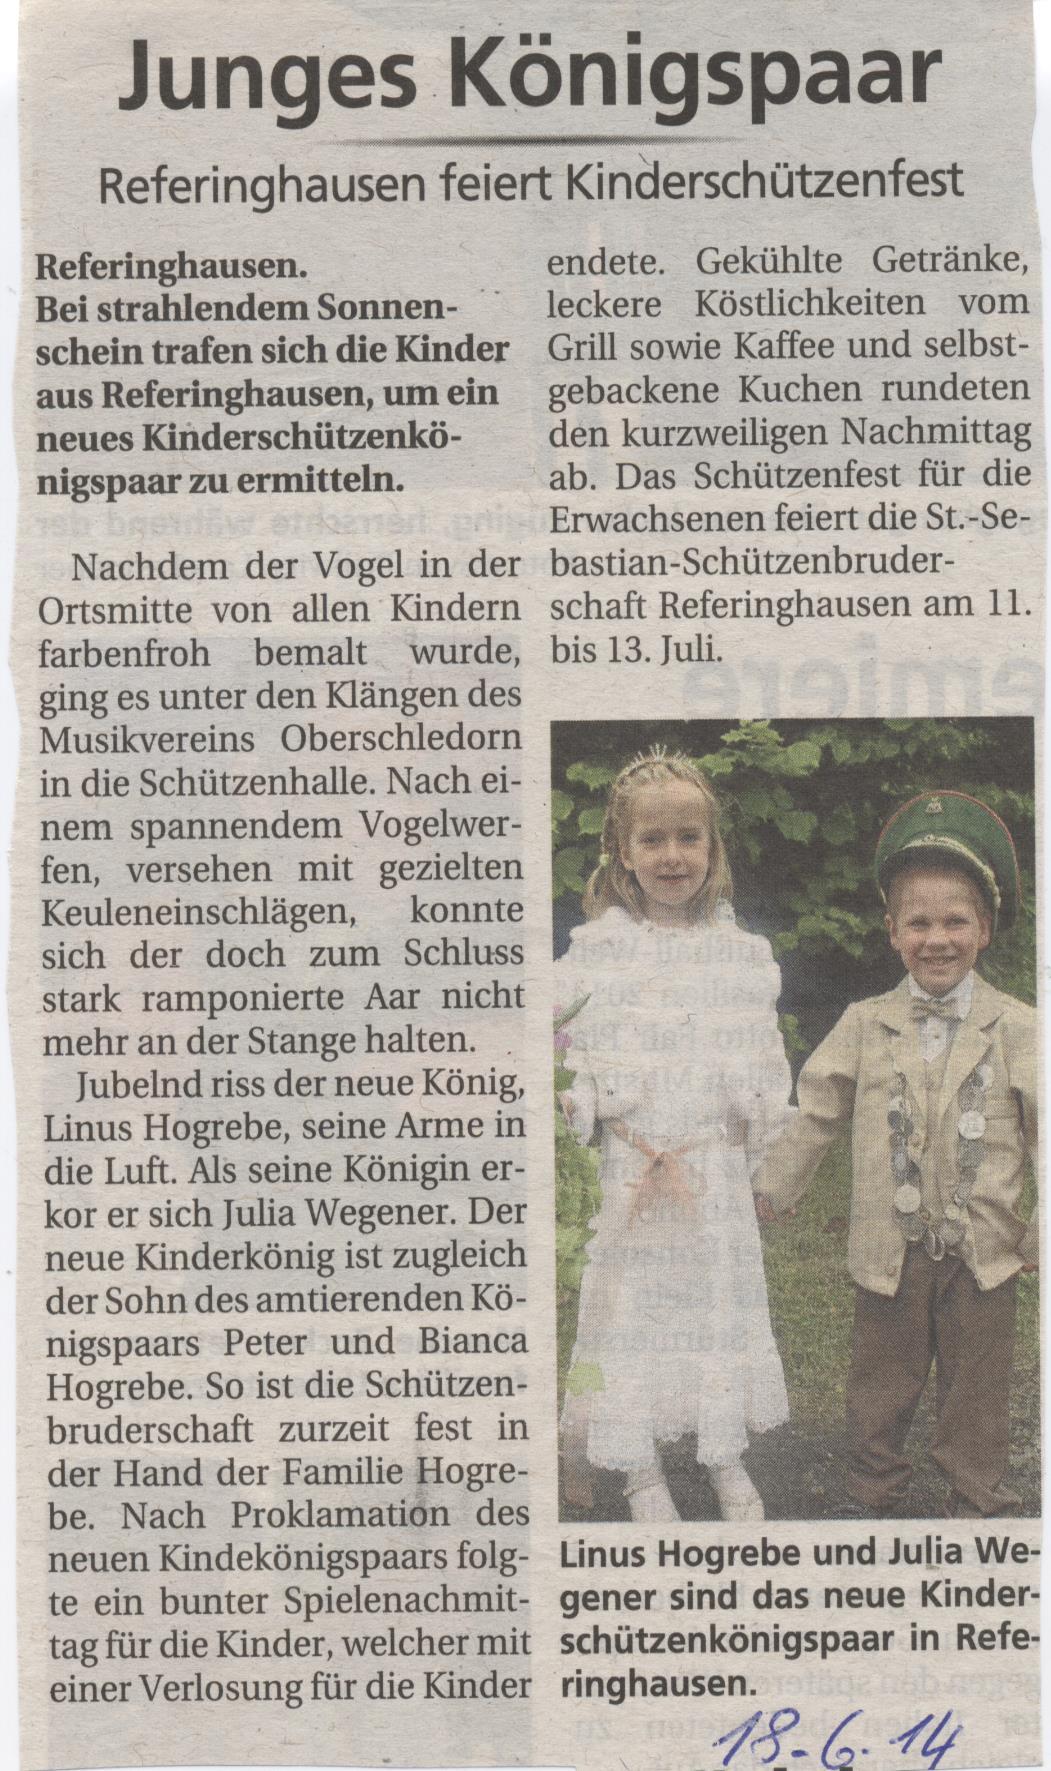 Kinderschützenkönigspaar Linus und Julia